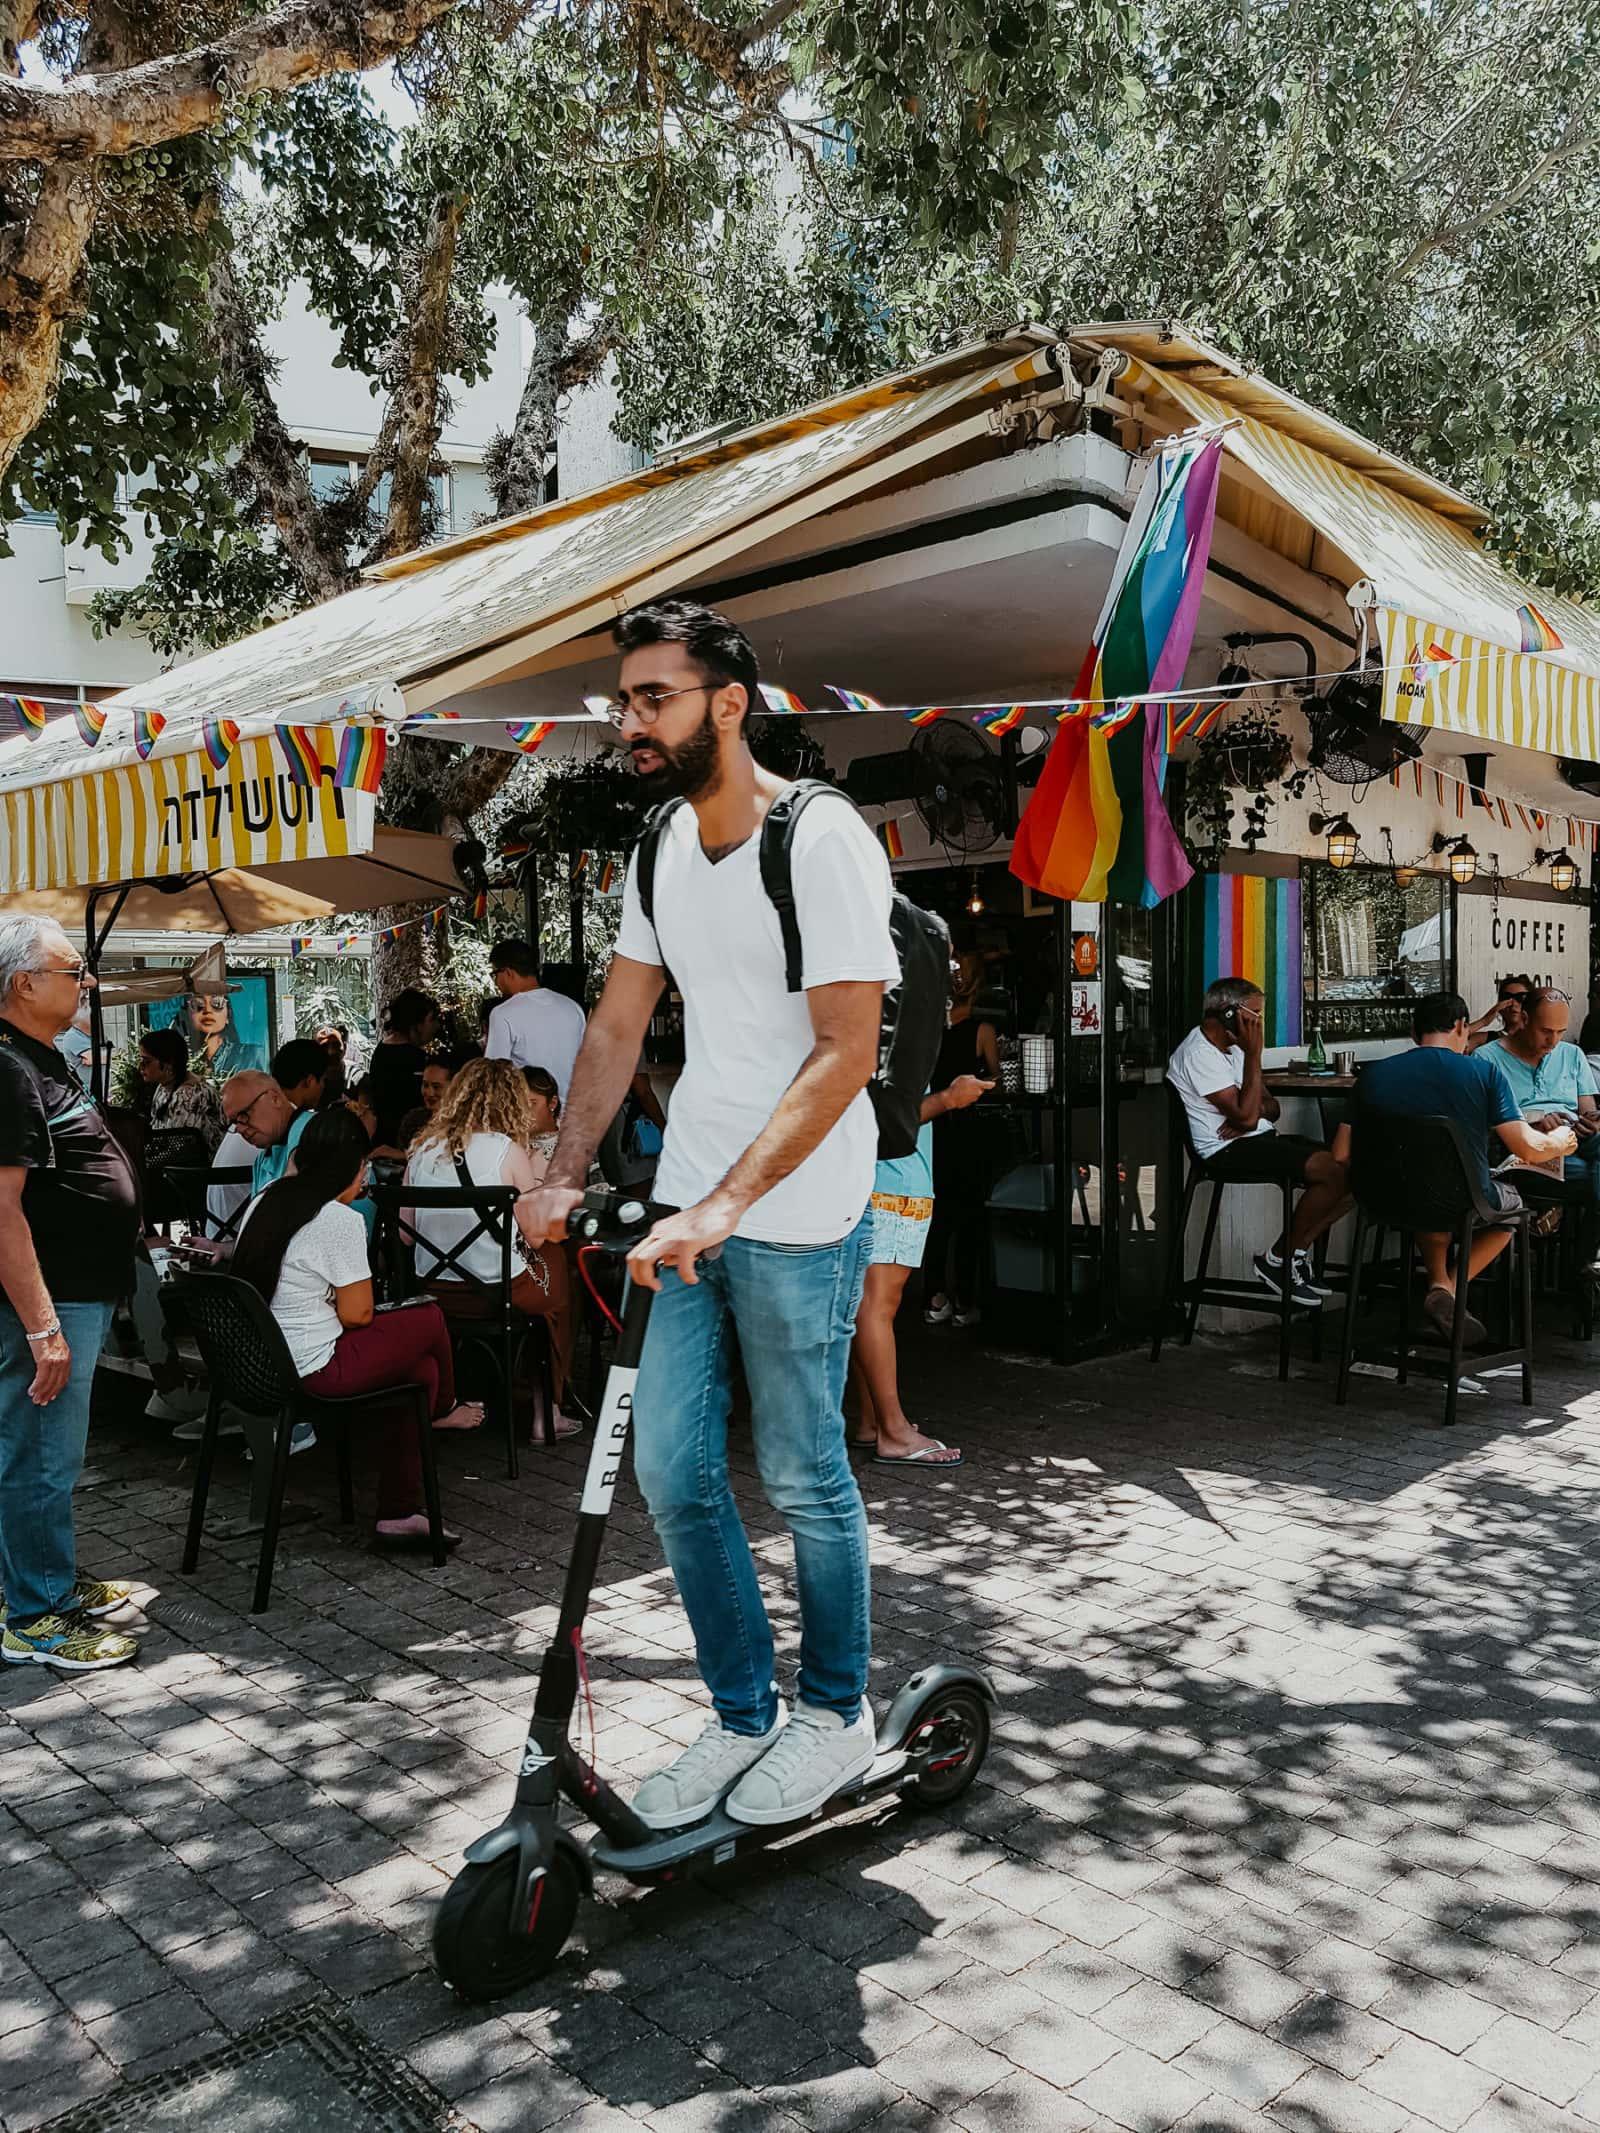 Tel Aviv Sehenswürdigkeiten Gazoz Buden Kiosk Cafés Rothschild Boulevard